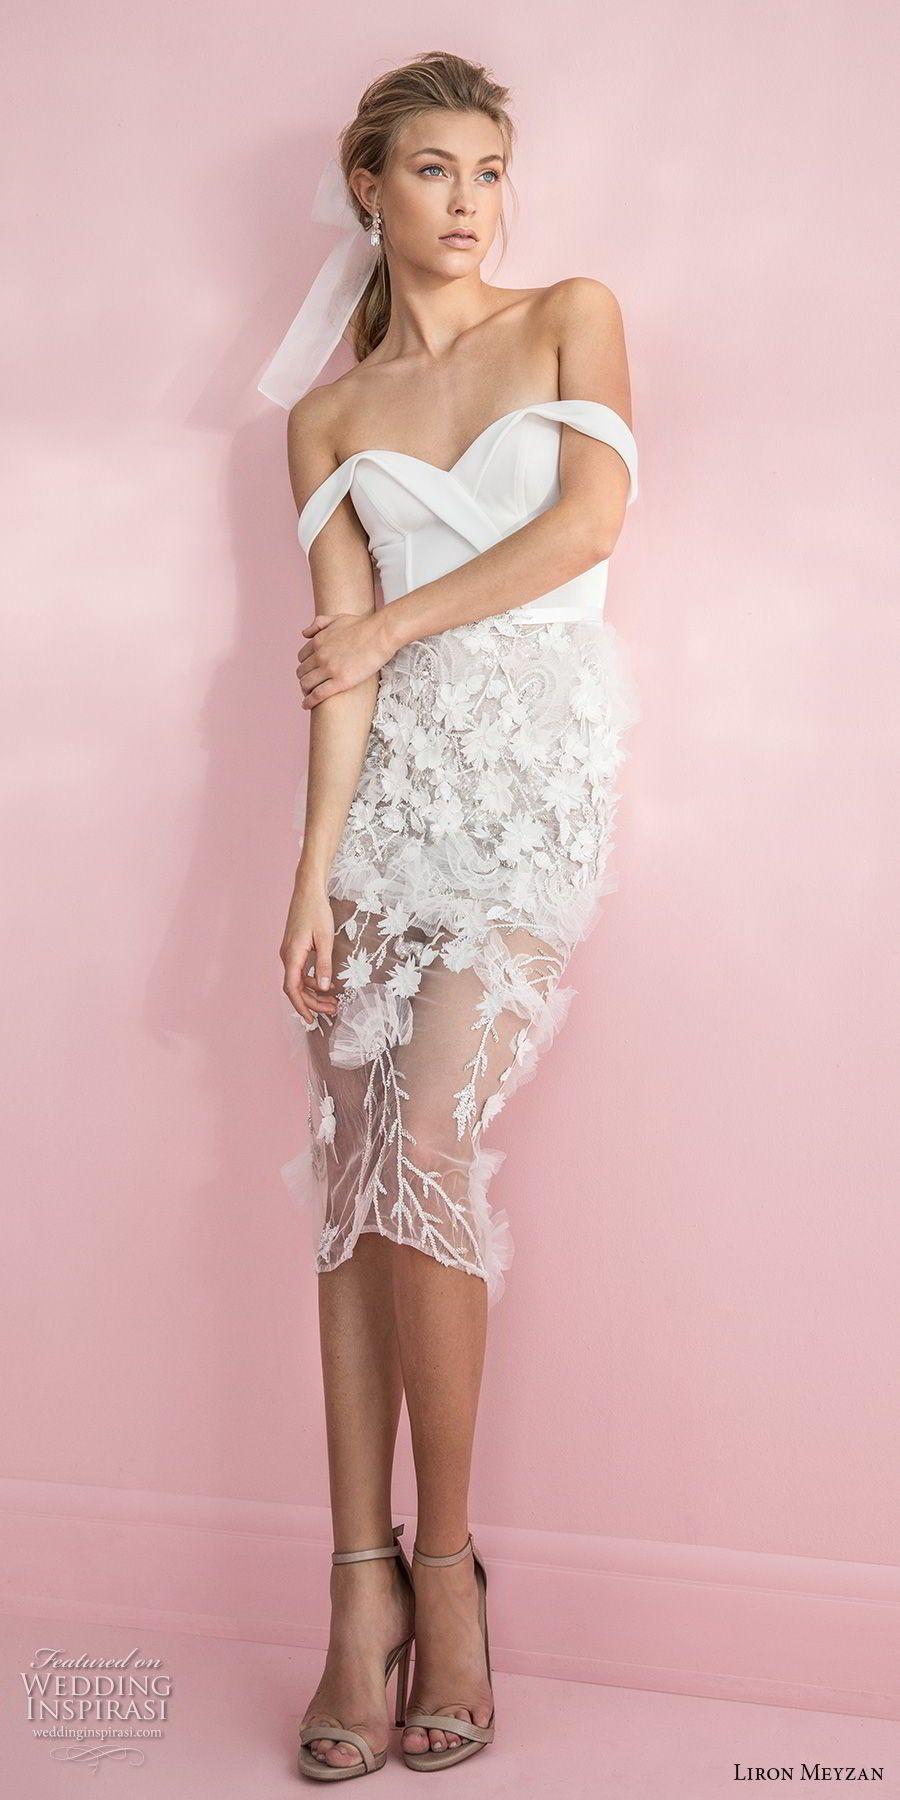 Liron meyzan wedding dresses u uclove in whiteud bridal